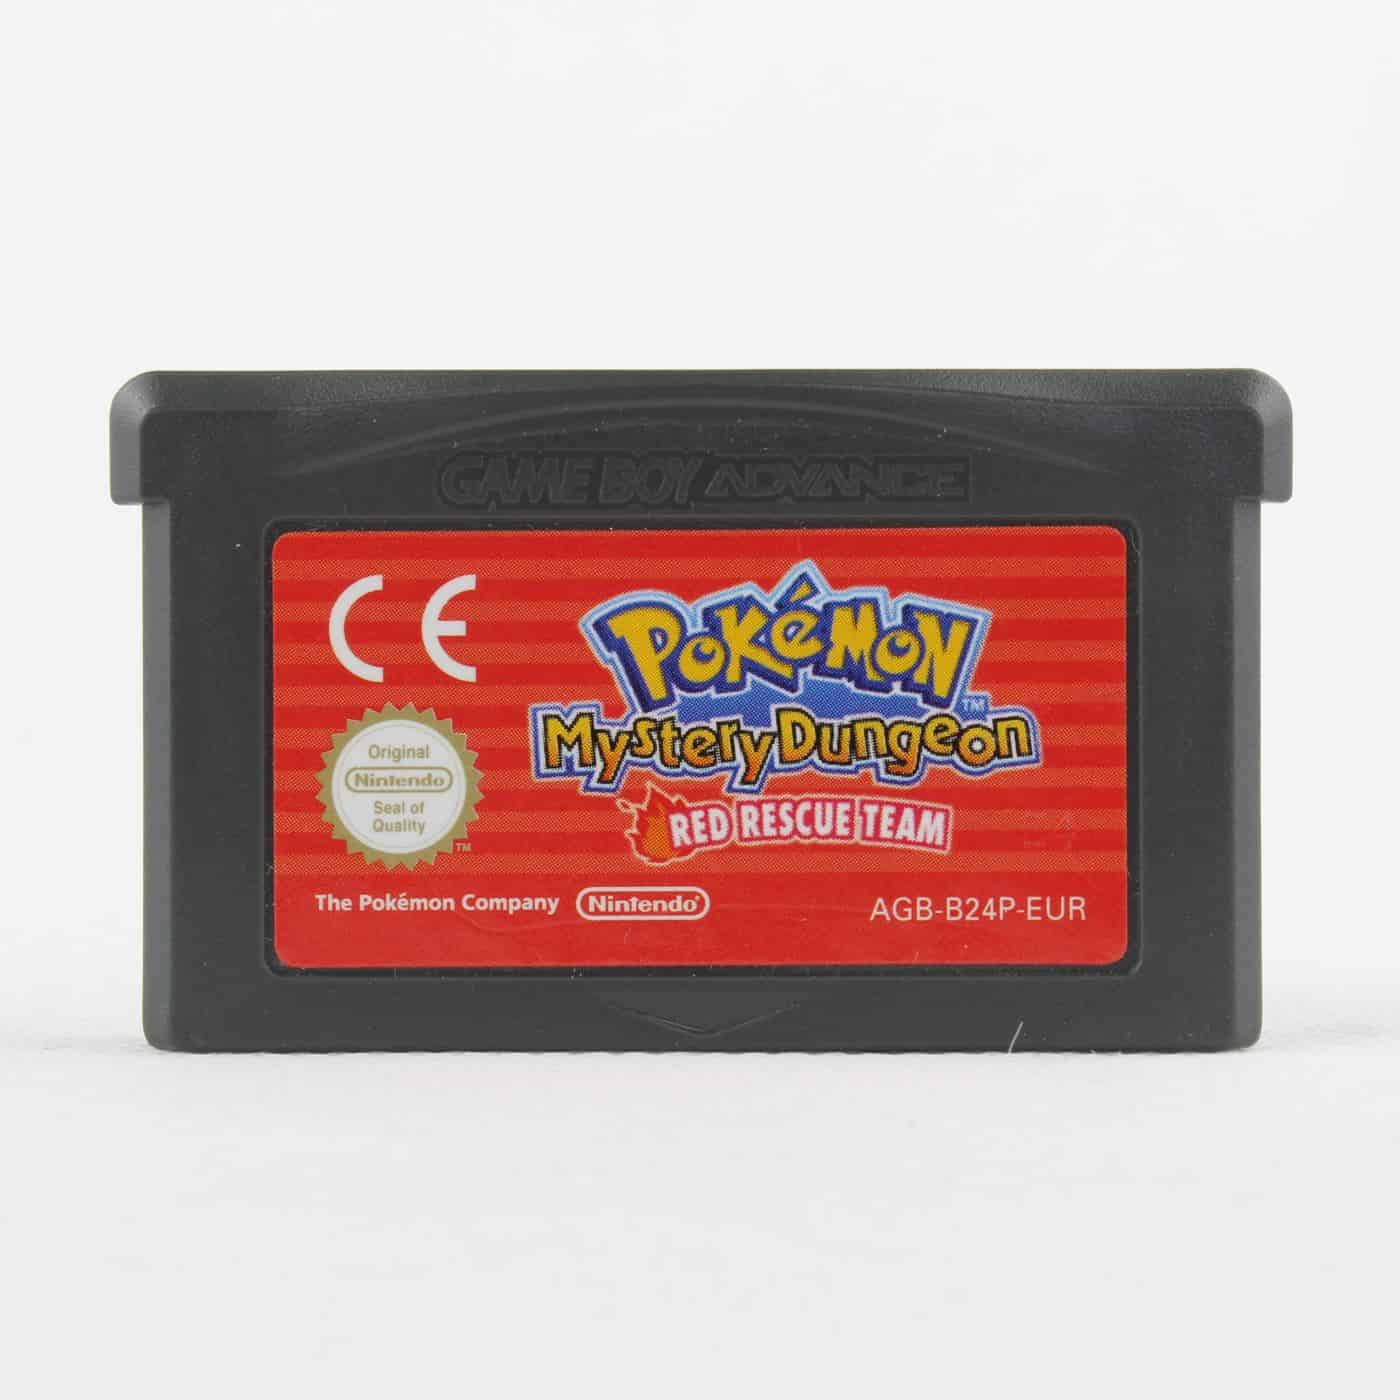 Pokémon Mystery Dungeon: Red Rescue Team (Game Boy Advance)